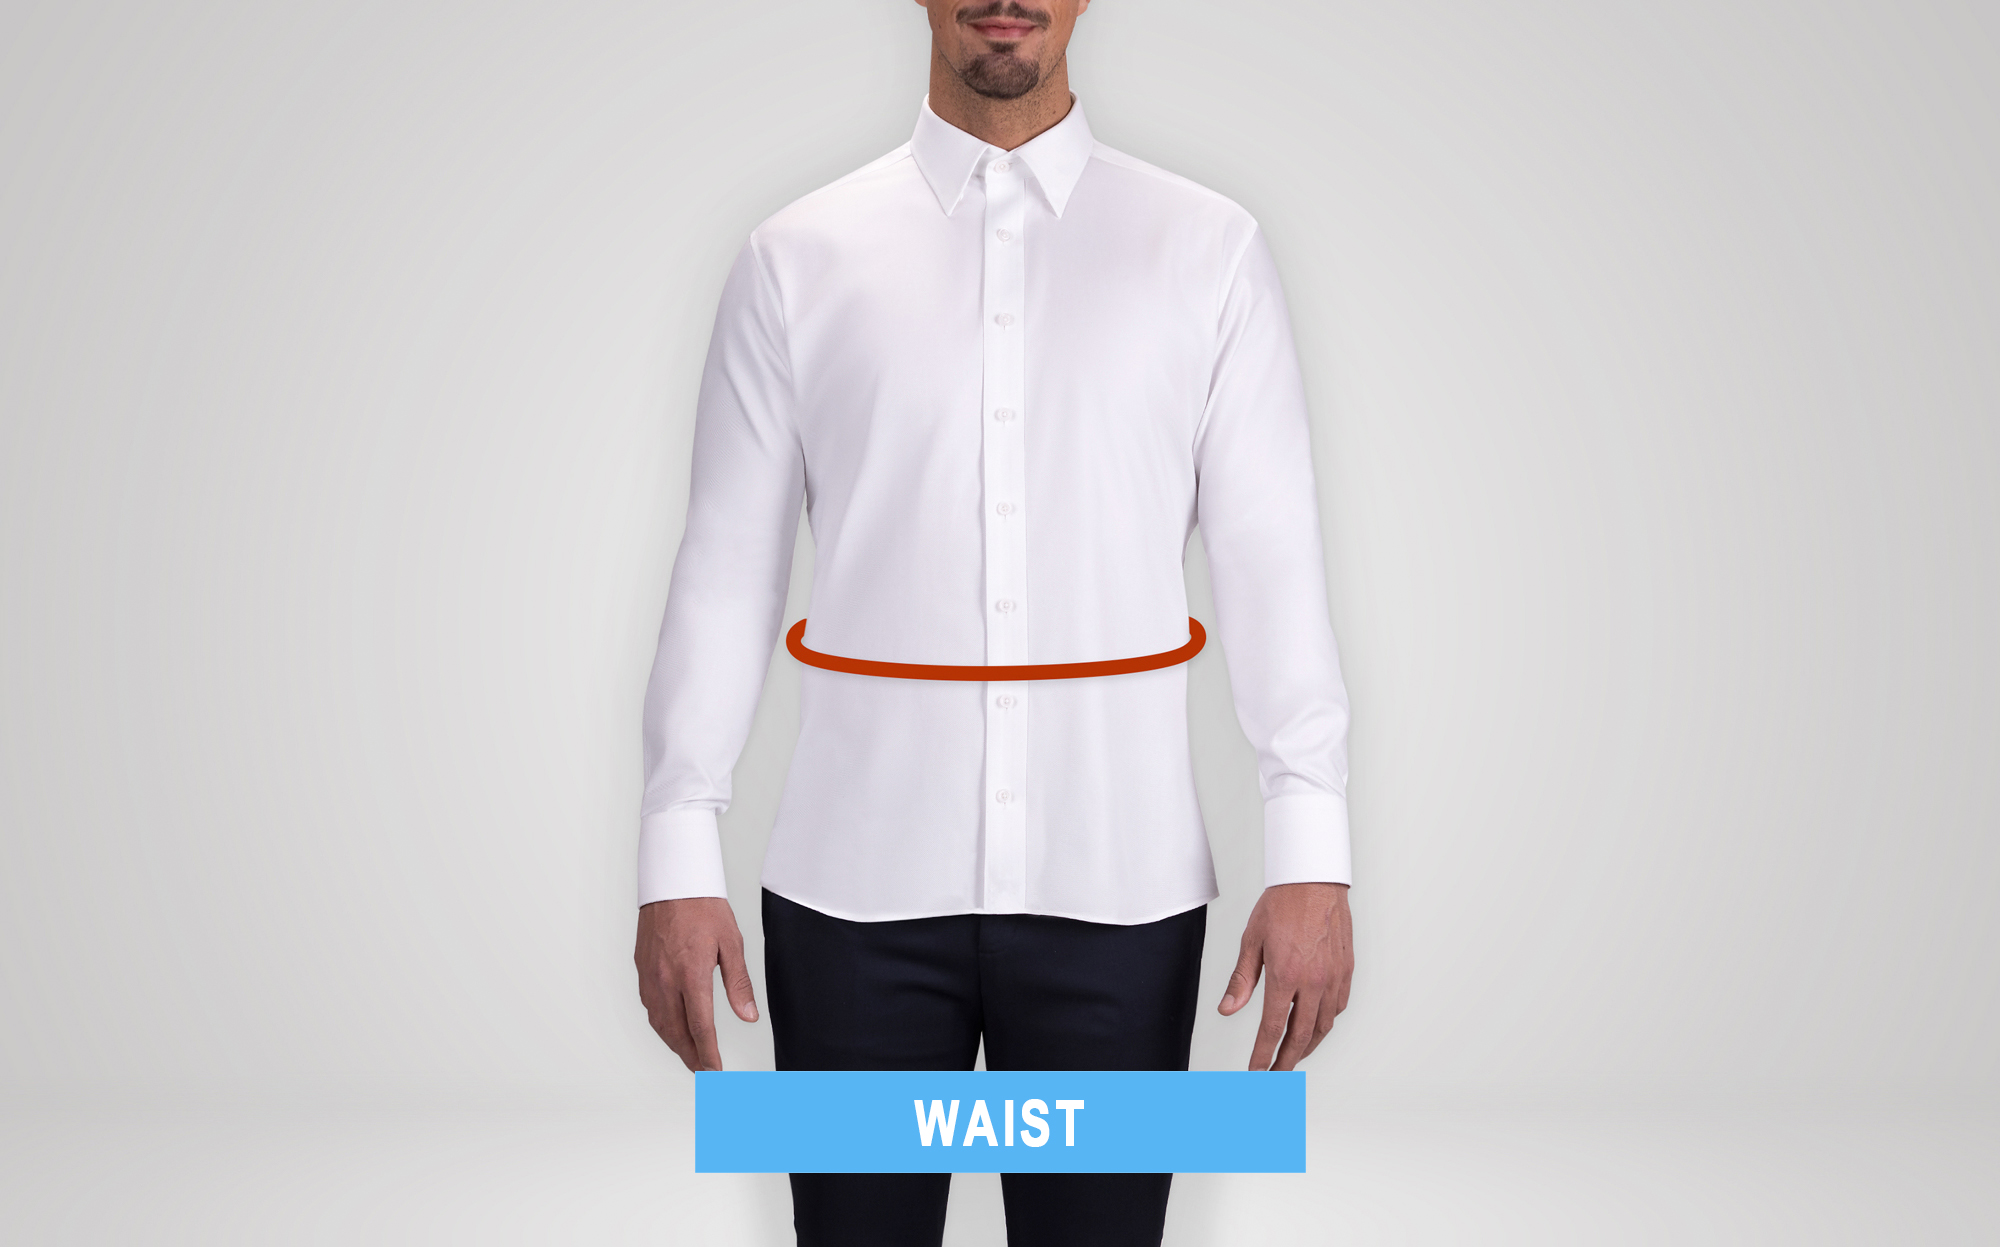 how to measure the jacket waist